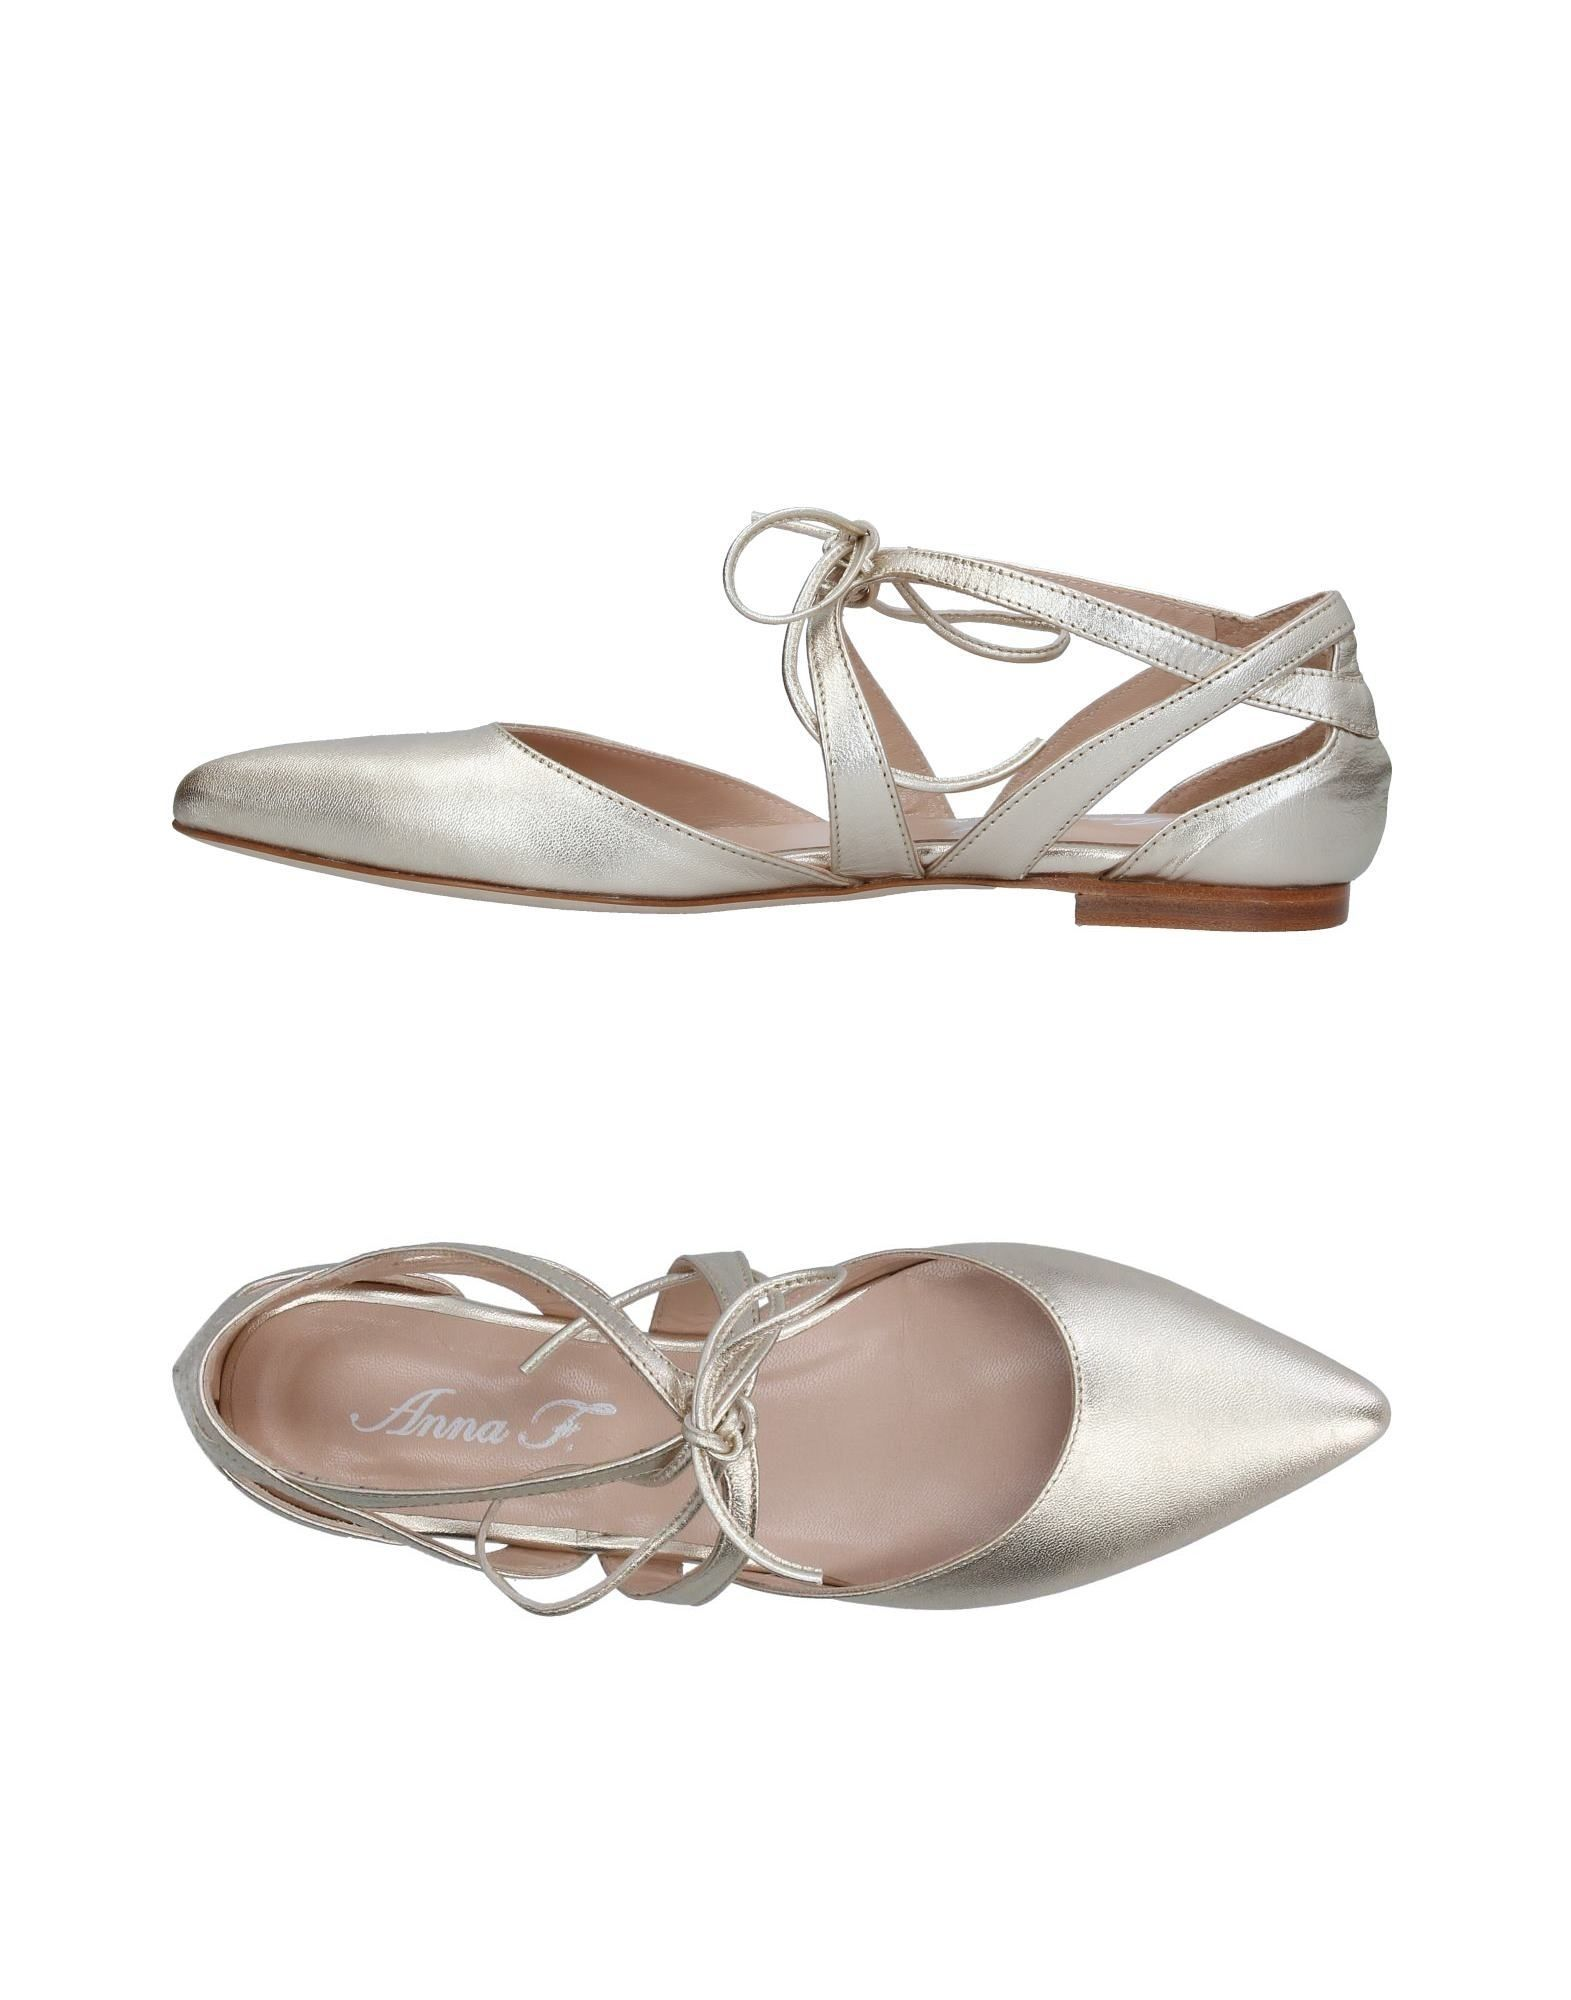 Ballerine Anna F. Donna Donna F. - 11368423LK 98bf8f